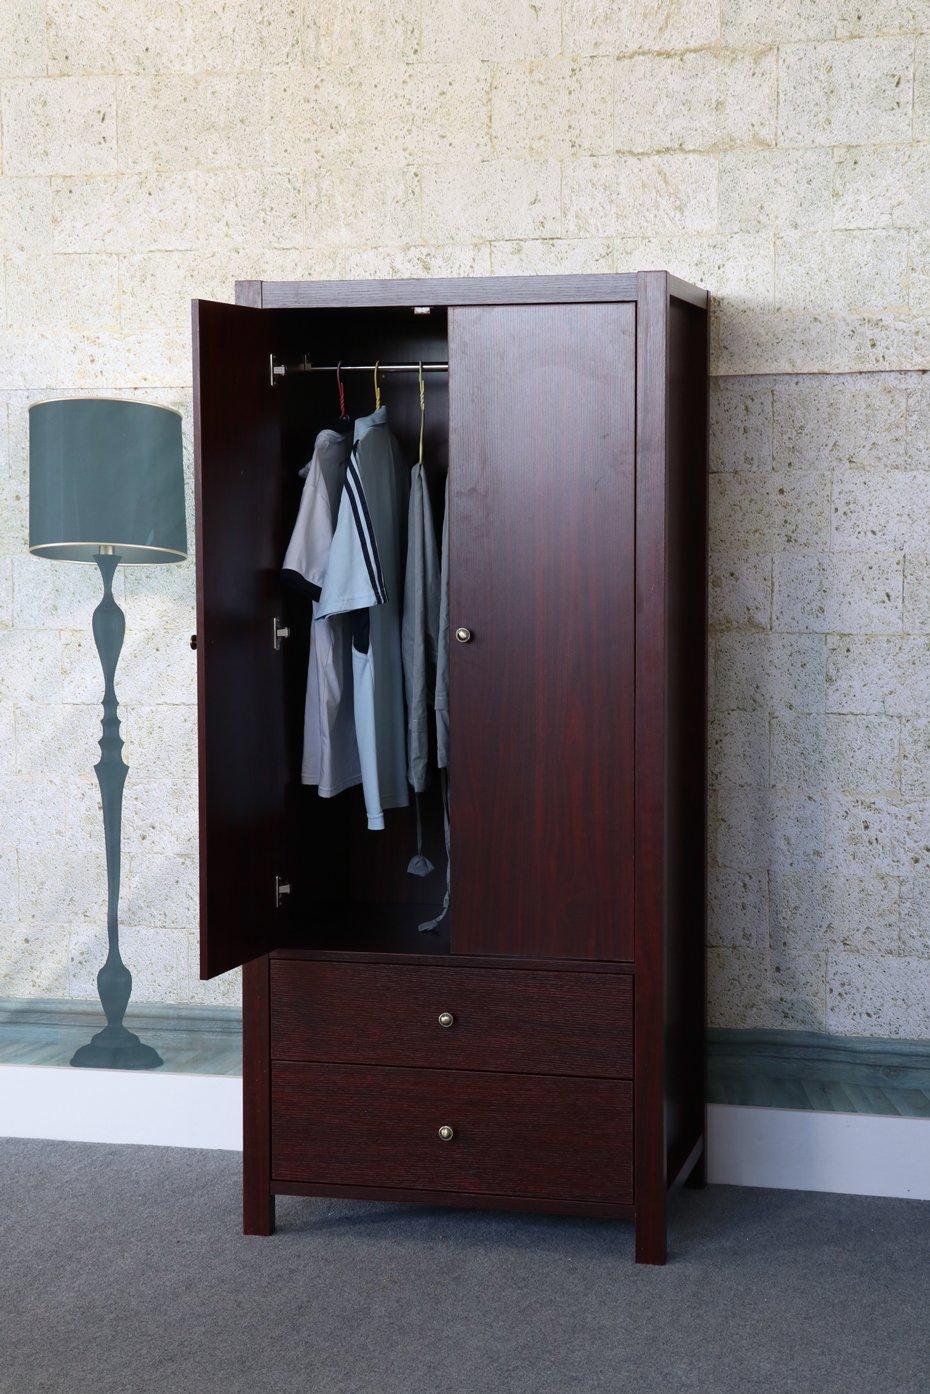 K16022 Smart Home Mahogany Clothing Storage with Drawers Wardrobe